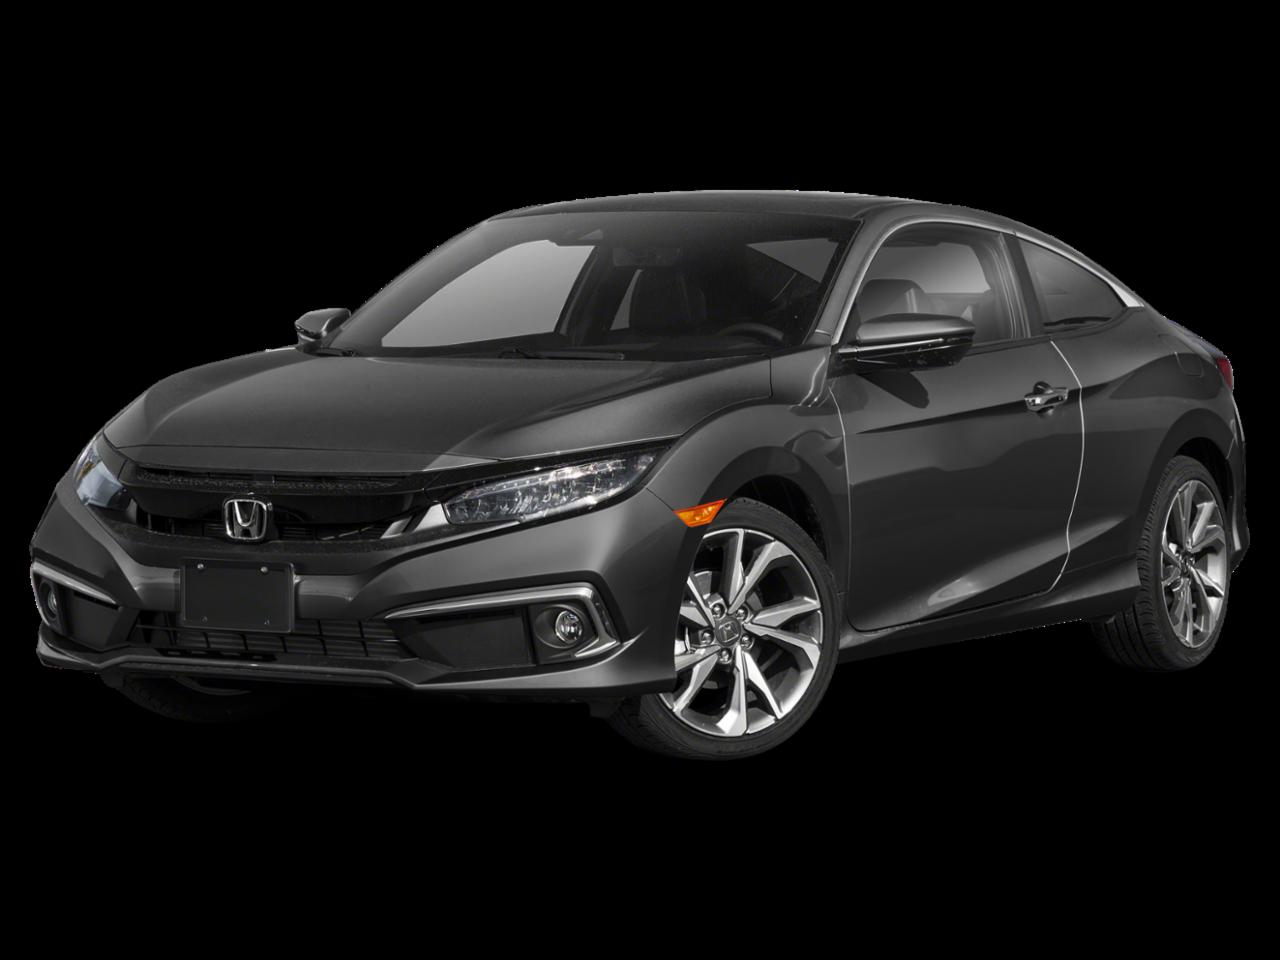 Honda 2020 Civic Coupe Touring